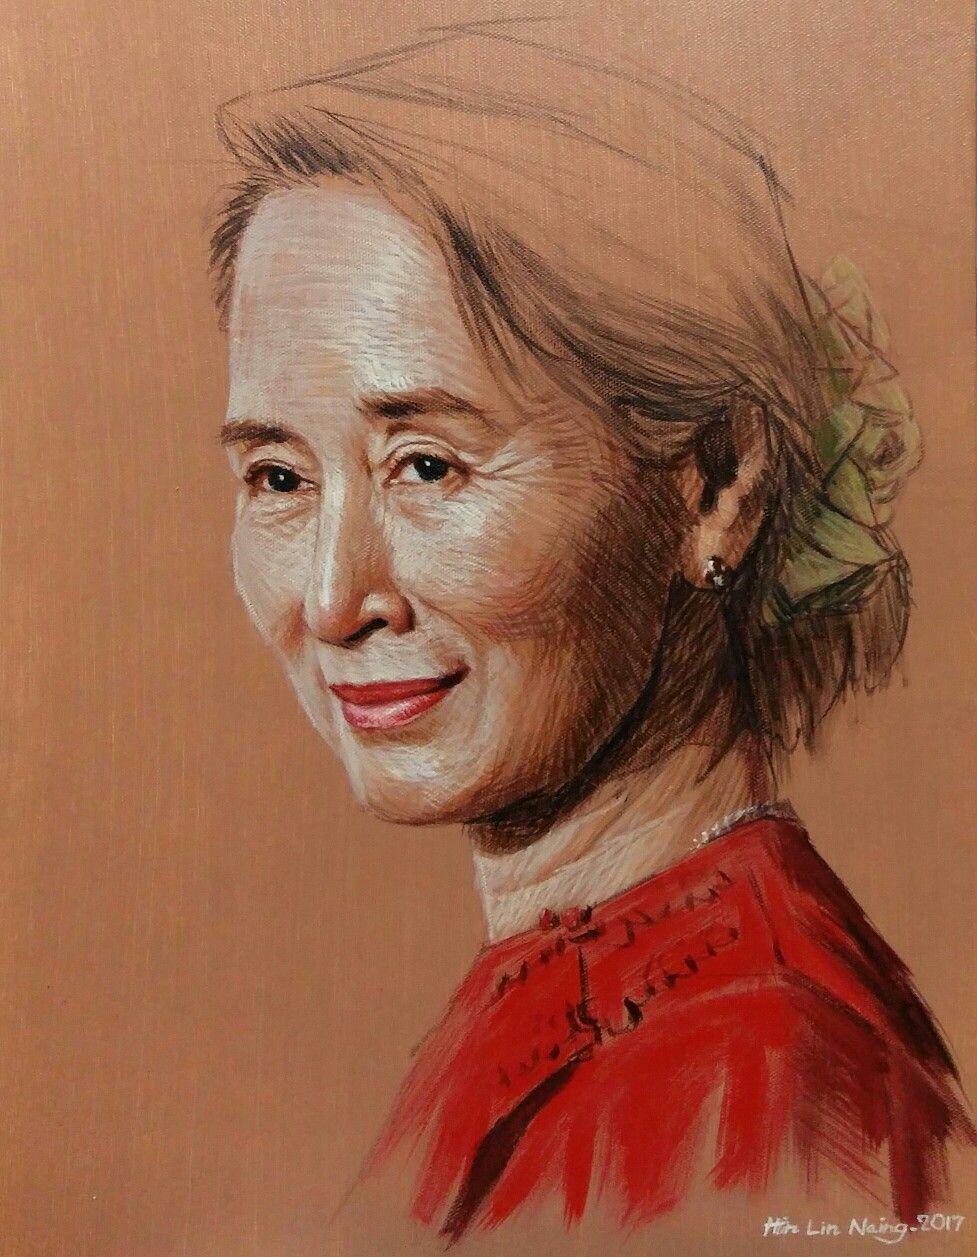 aung san suu kyi x a c by artist htin lin naing myanmar  aung san suu kyi 14 x18 a c by artist htin